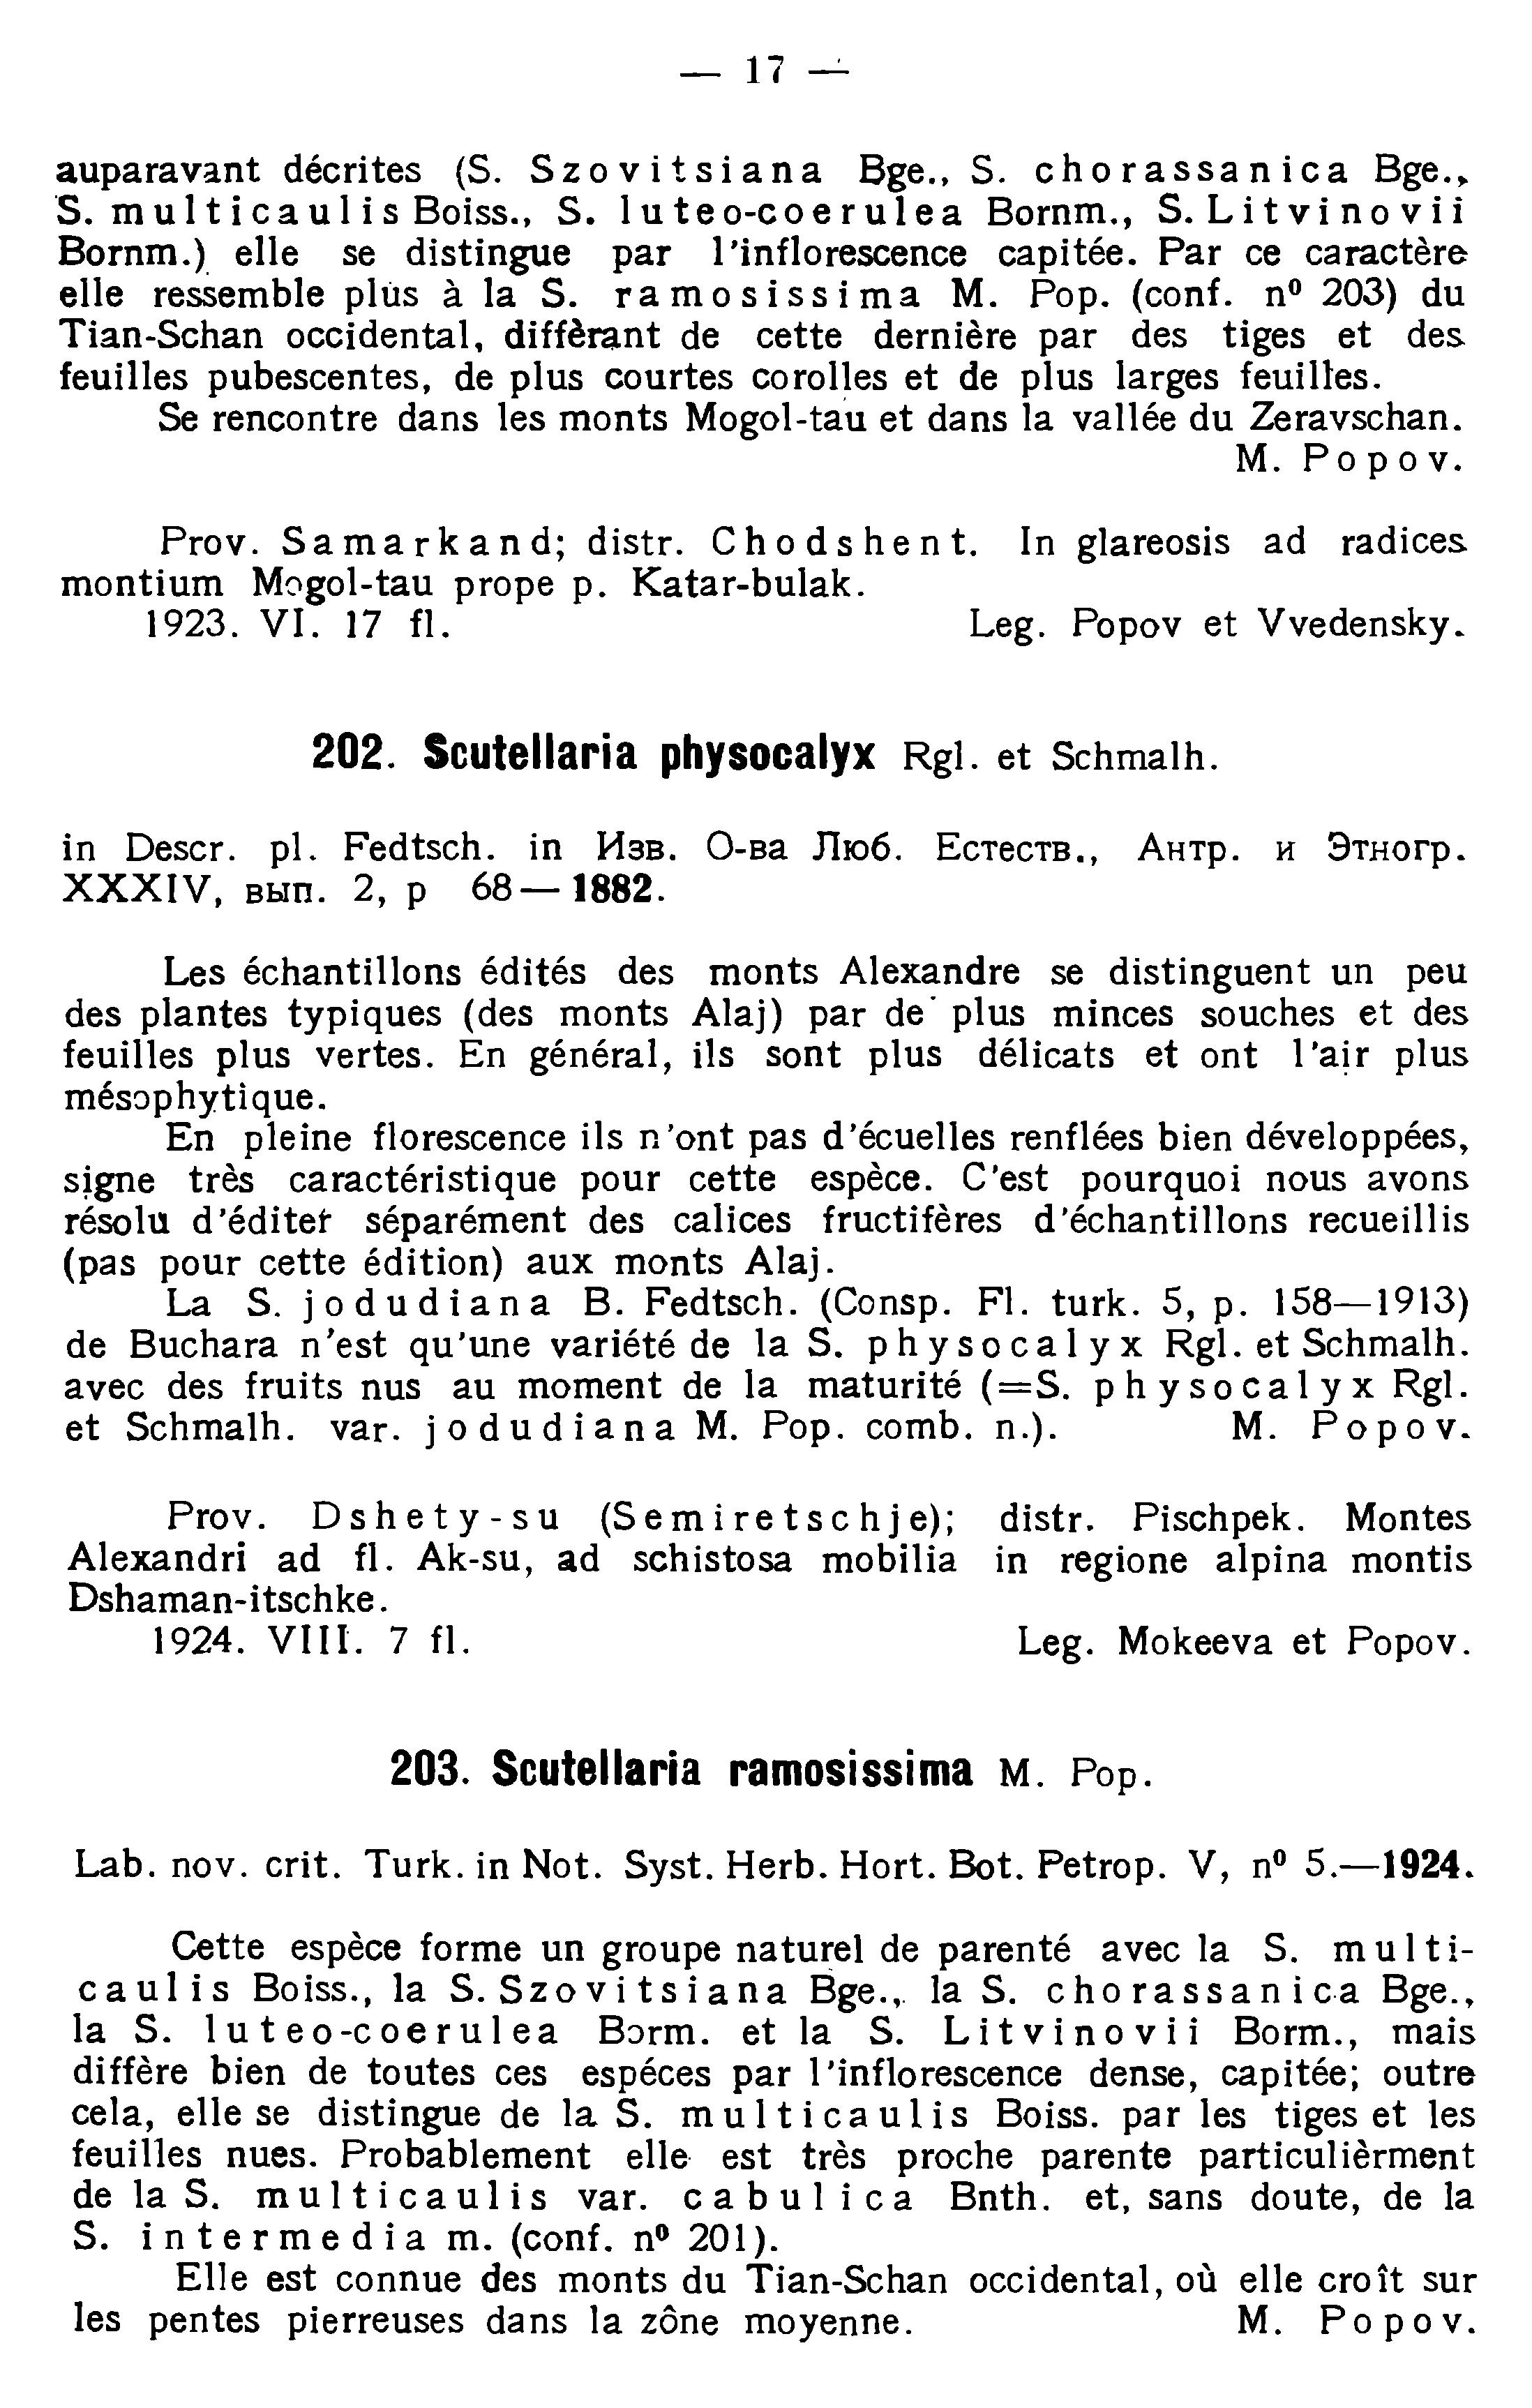 https://forum.plantarium.ru/misc.php?action=pun_attachment&item=26481&download=1